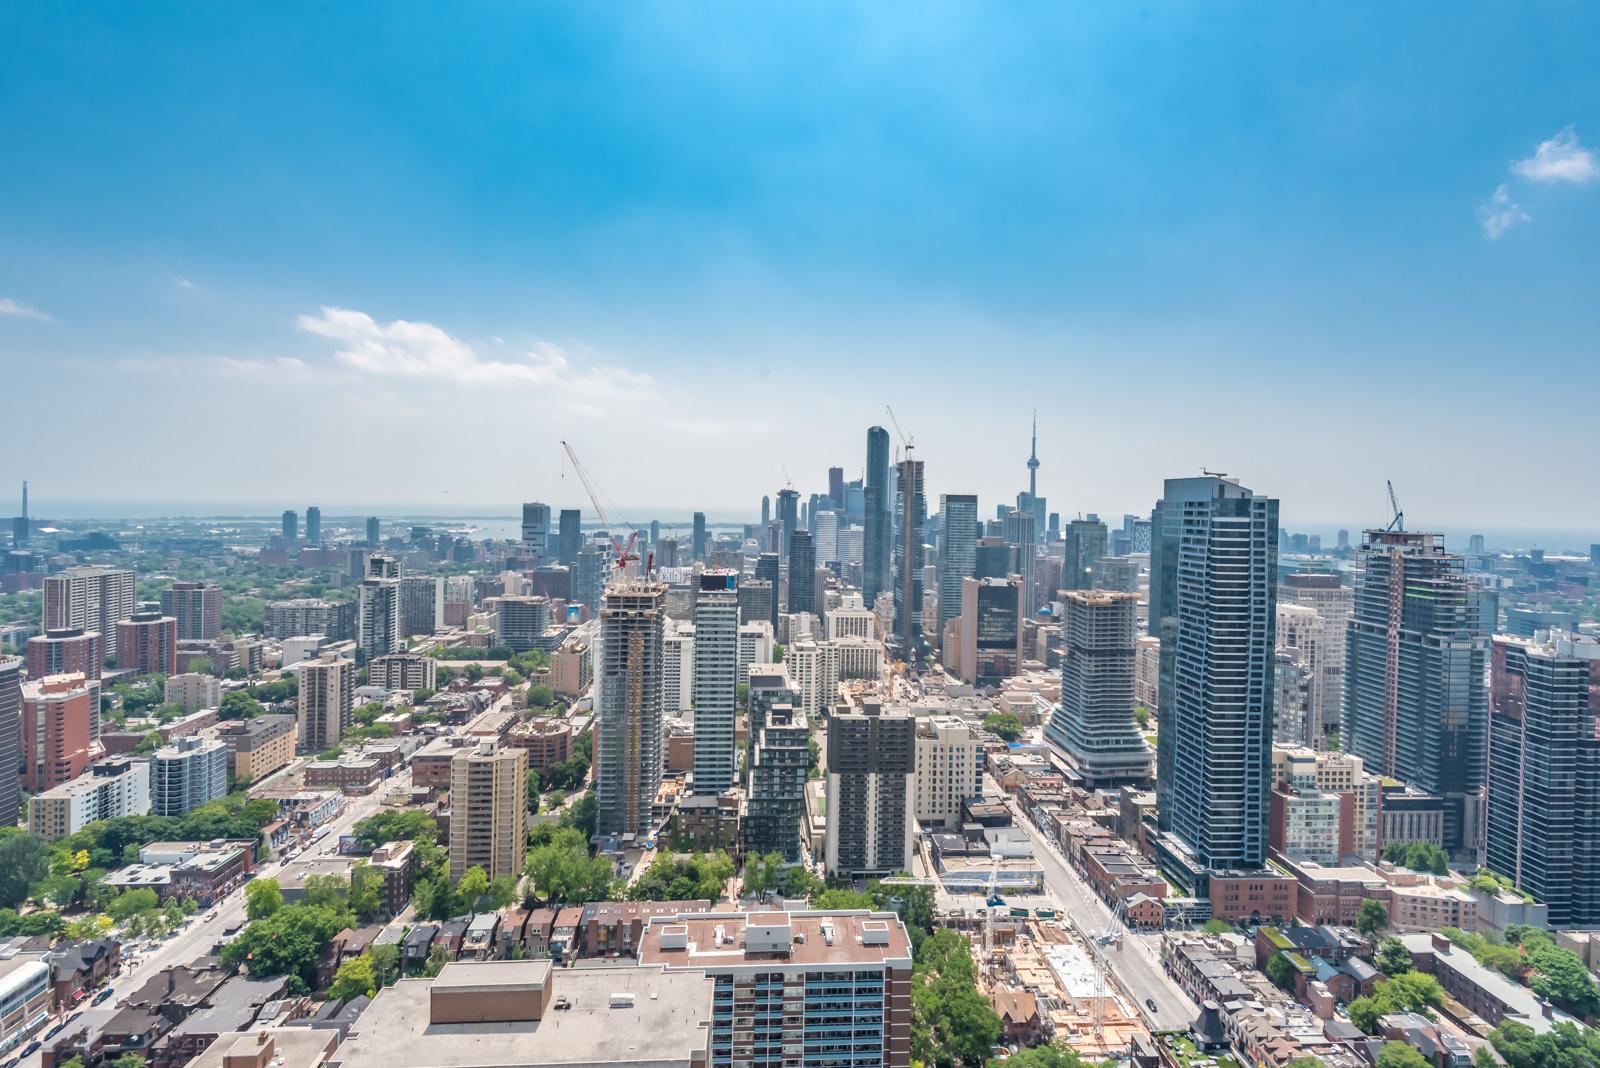 Toronto skyline at day time